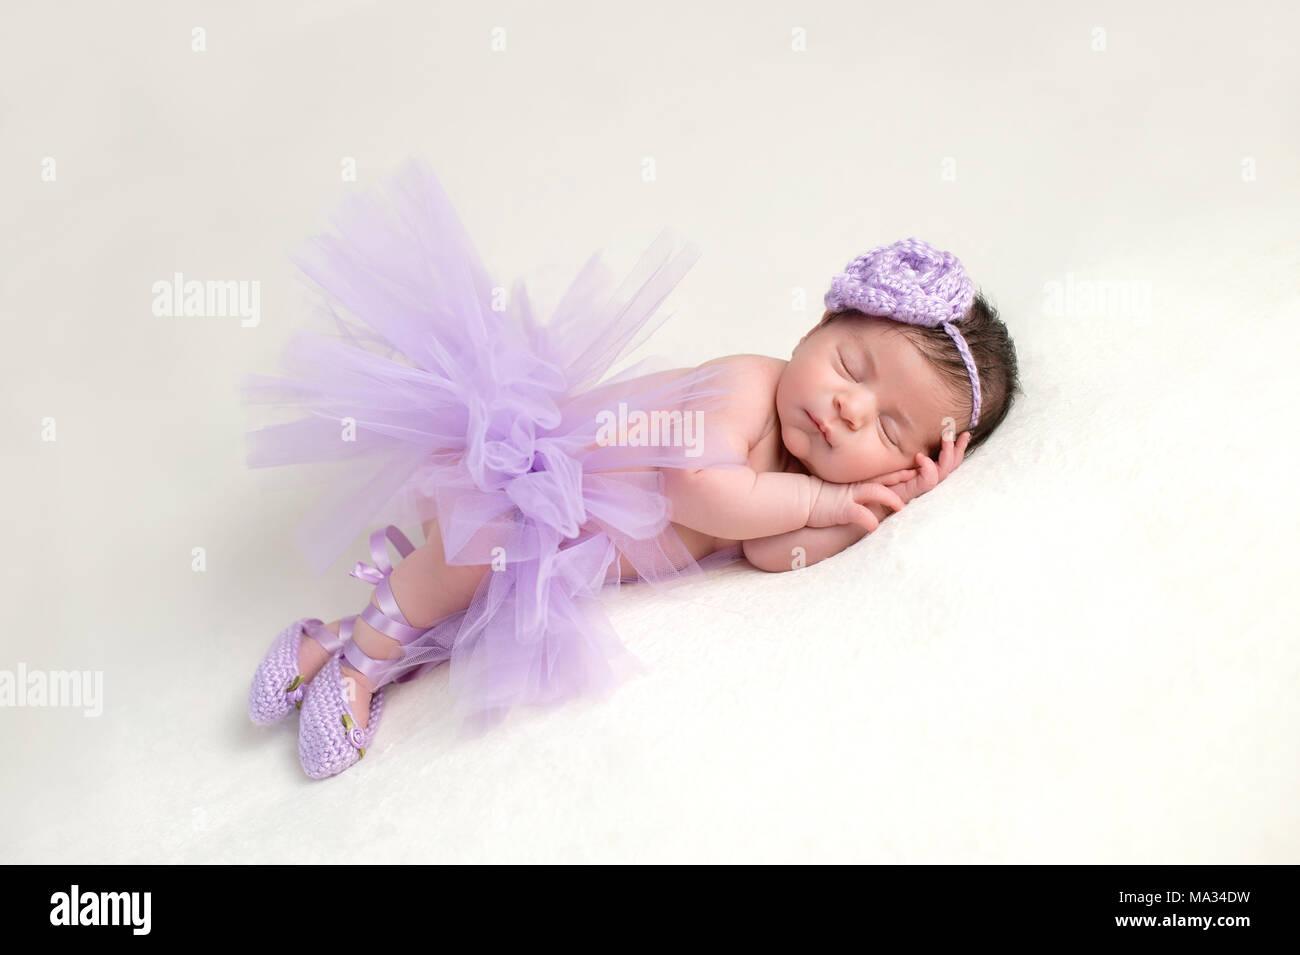 3c7dc81c1 Sleeping, newborn baby girl wearing a lavender colored, crocheted, flower  headband, ballet